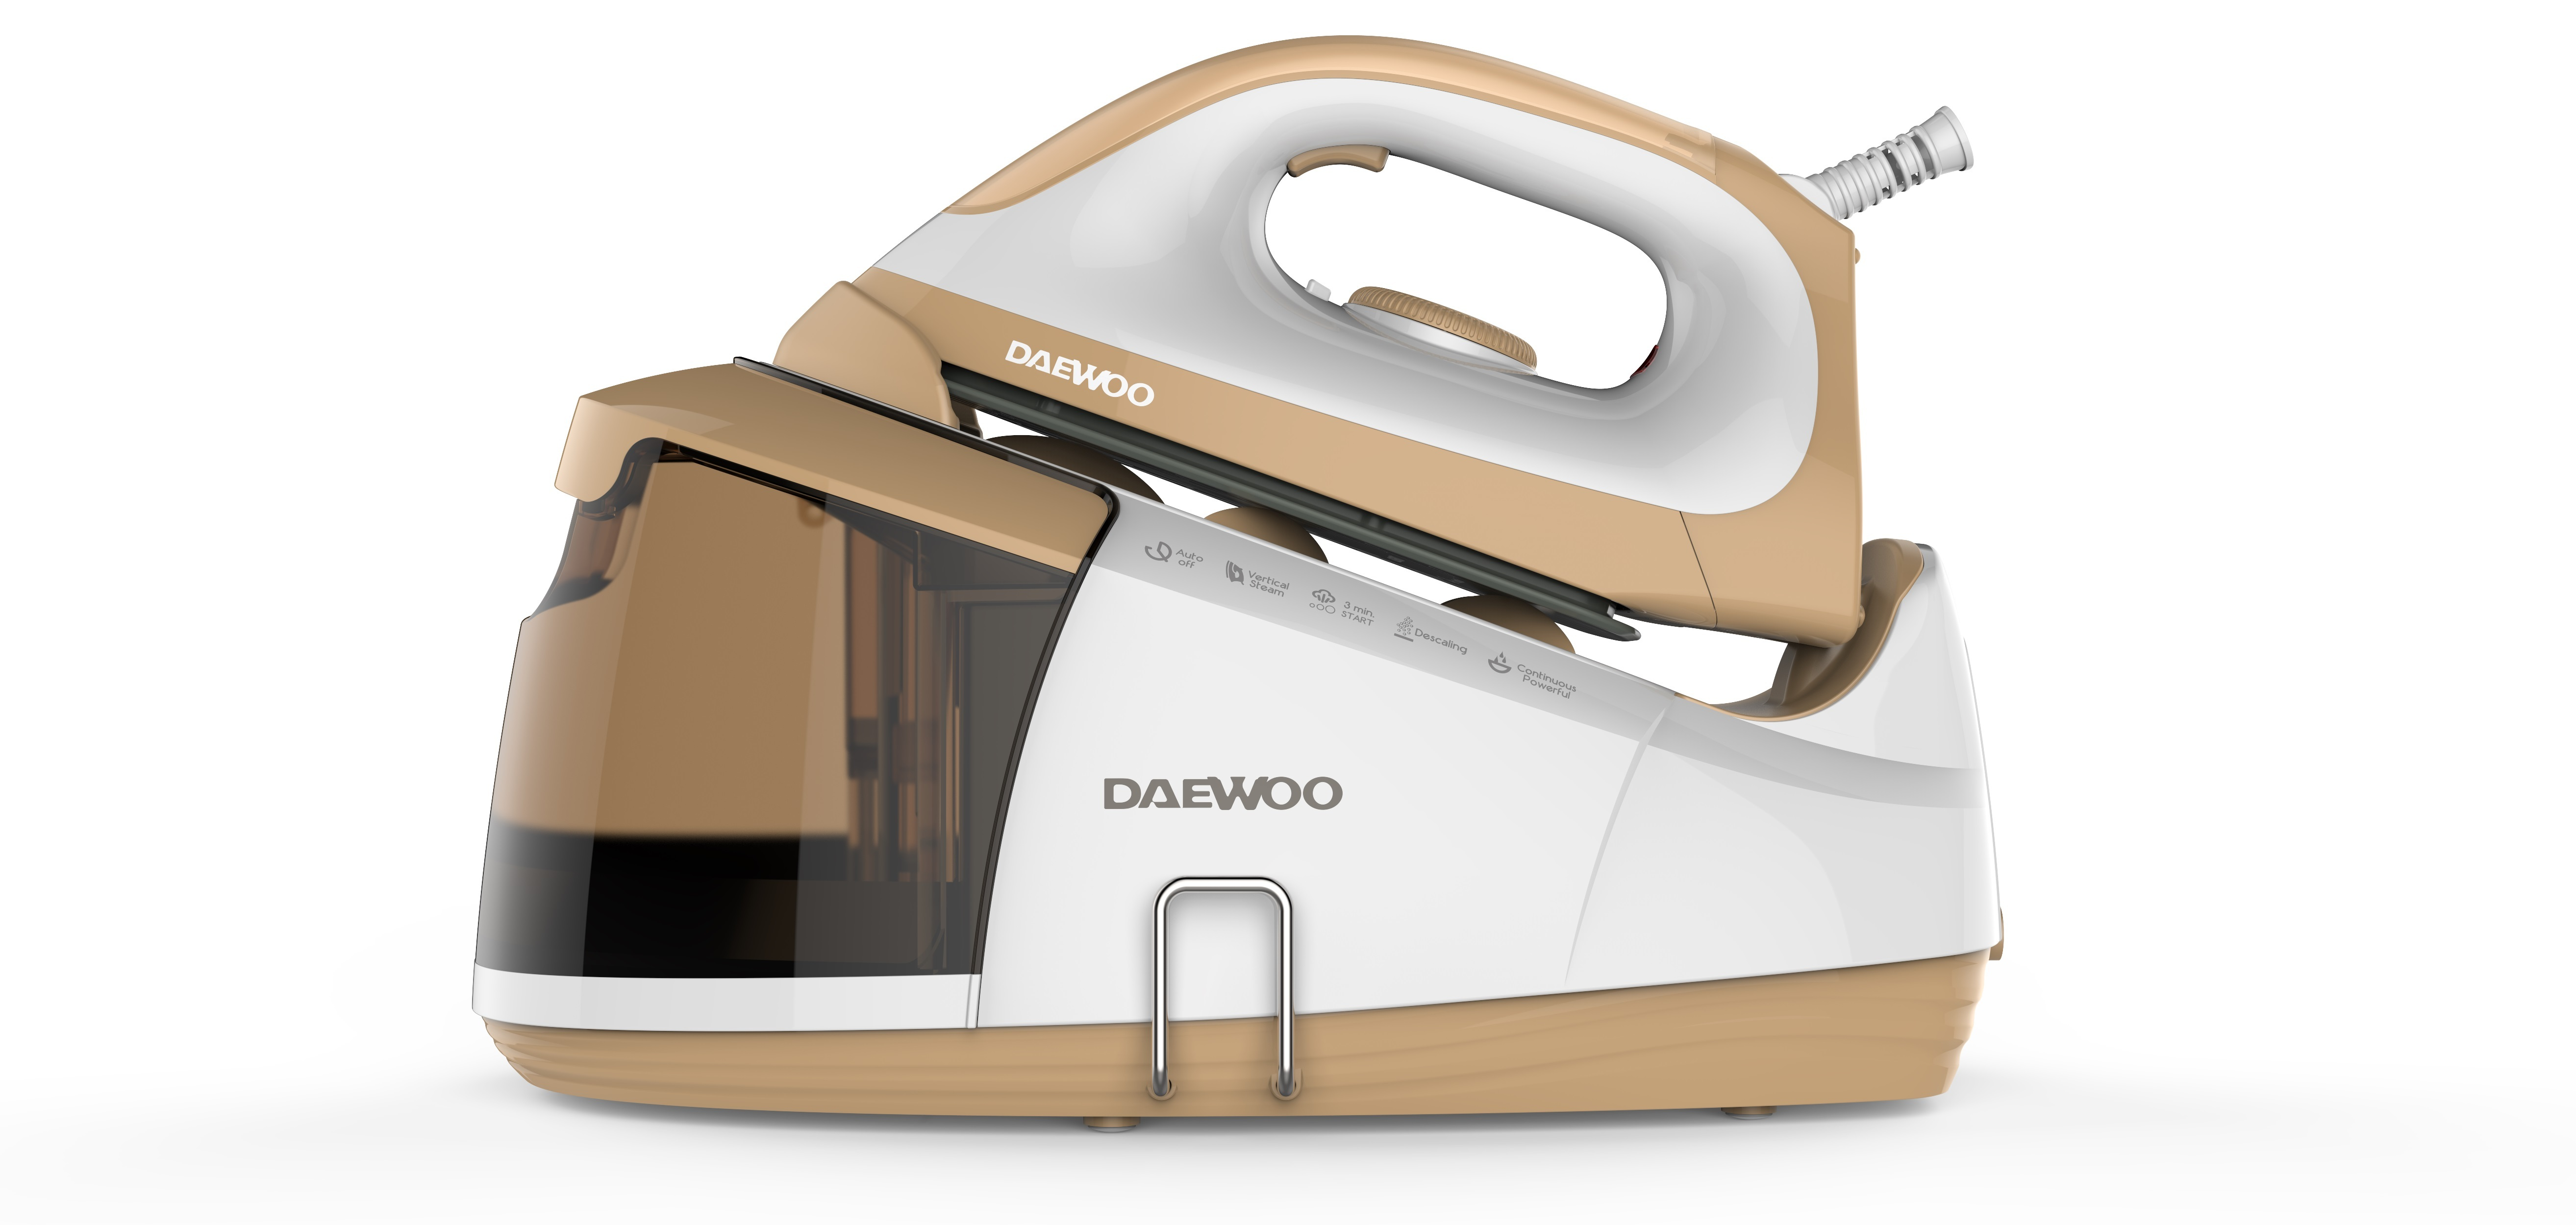 daewoo centrale vapeur 2400w 5bars d bit 120g mn r servoir amovible semelle c ramique ultra. Black Bedroom Furniture Sets. Home Design Ideas